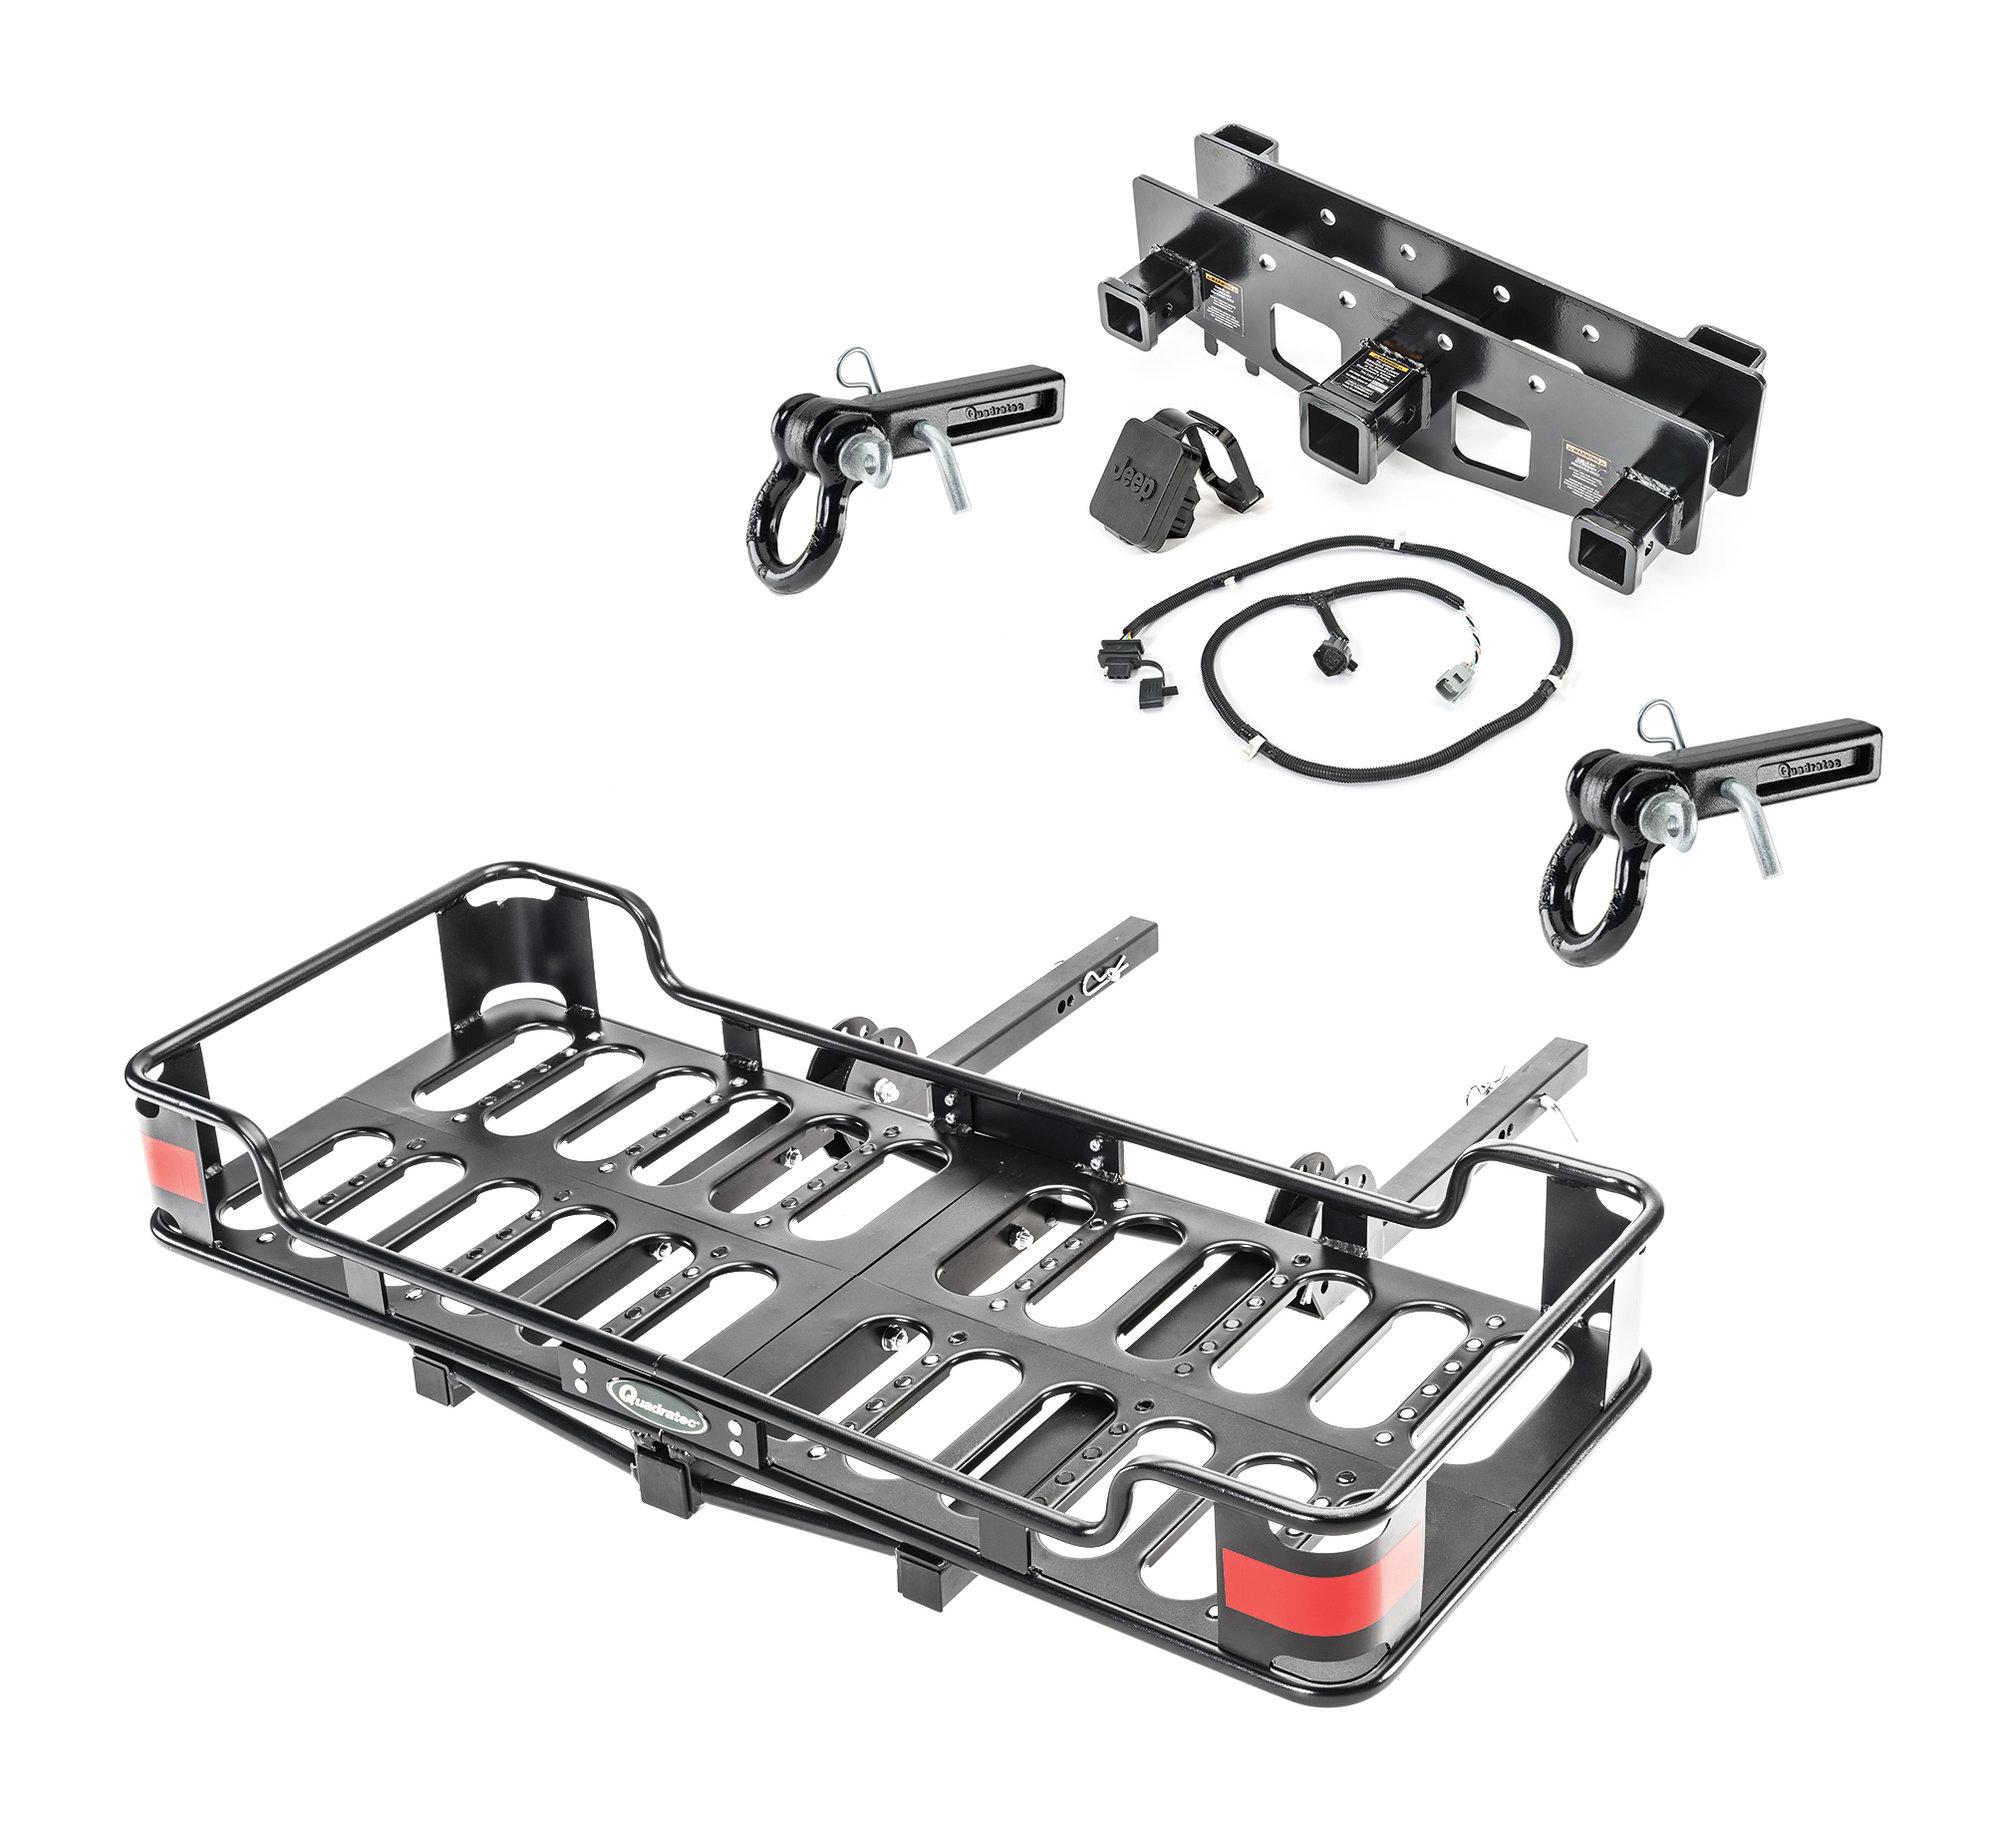 VersaHitch Receiver, Wiring Kit, Jeep Logo Plug, Cargo